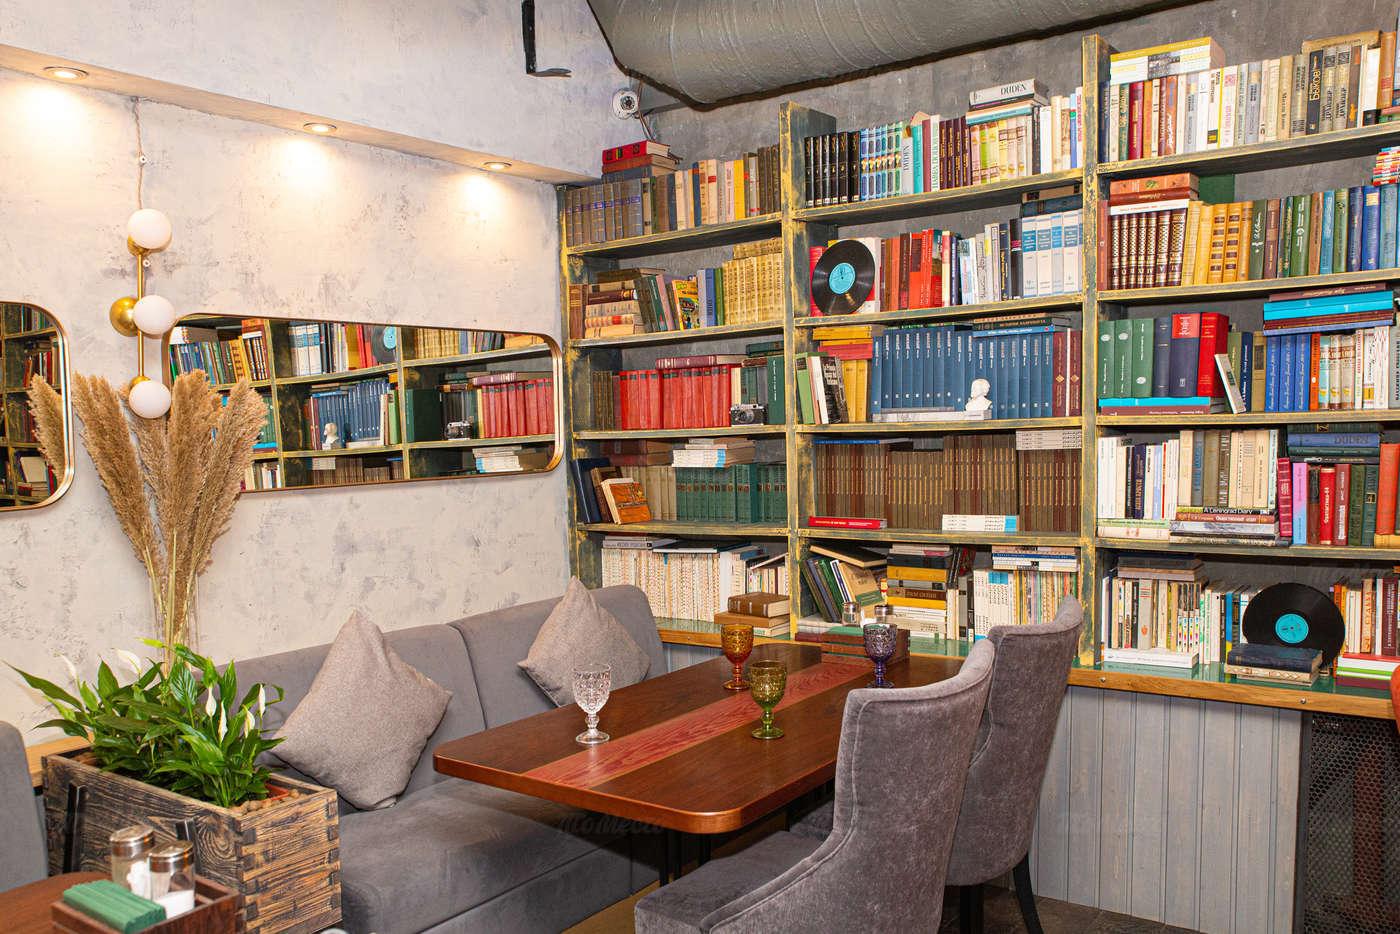 Ресторан IL LETTERATO (Литератор) в Петроверигском переулке фото 12